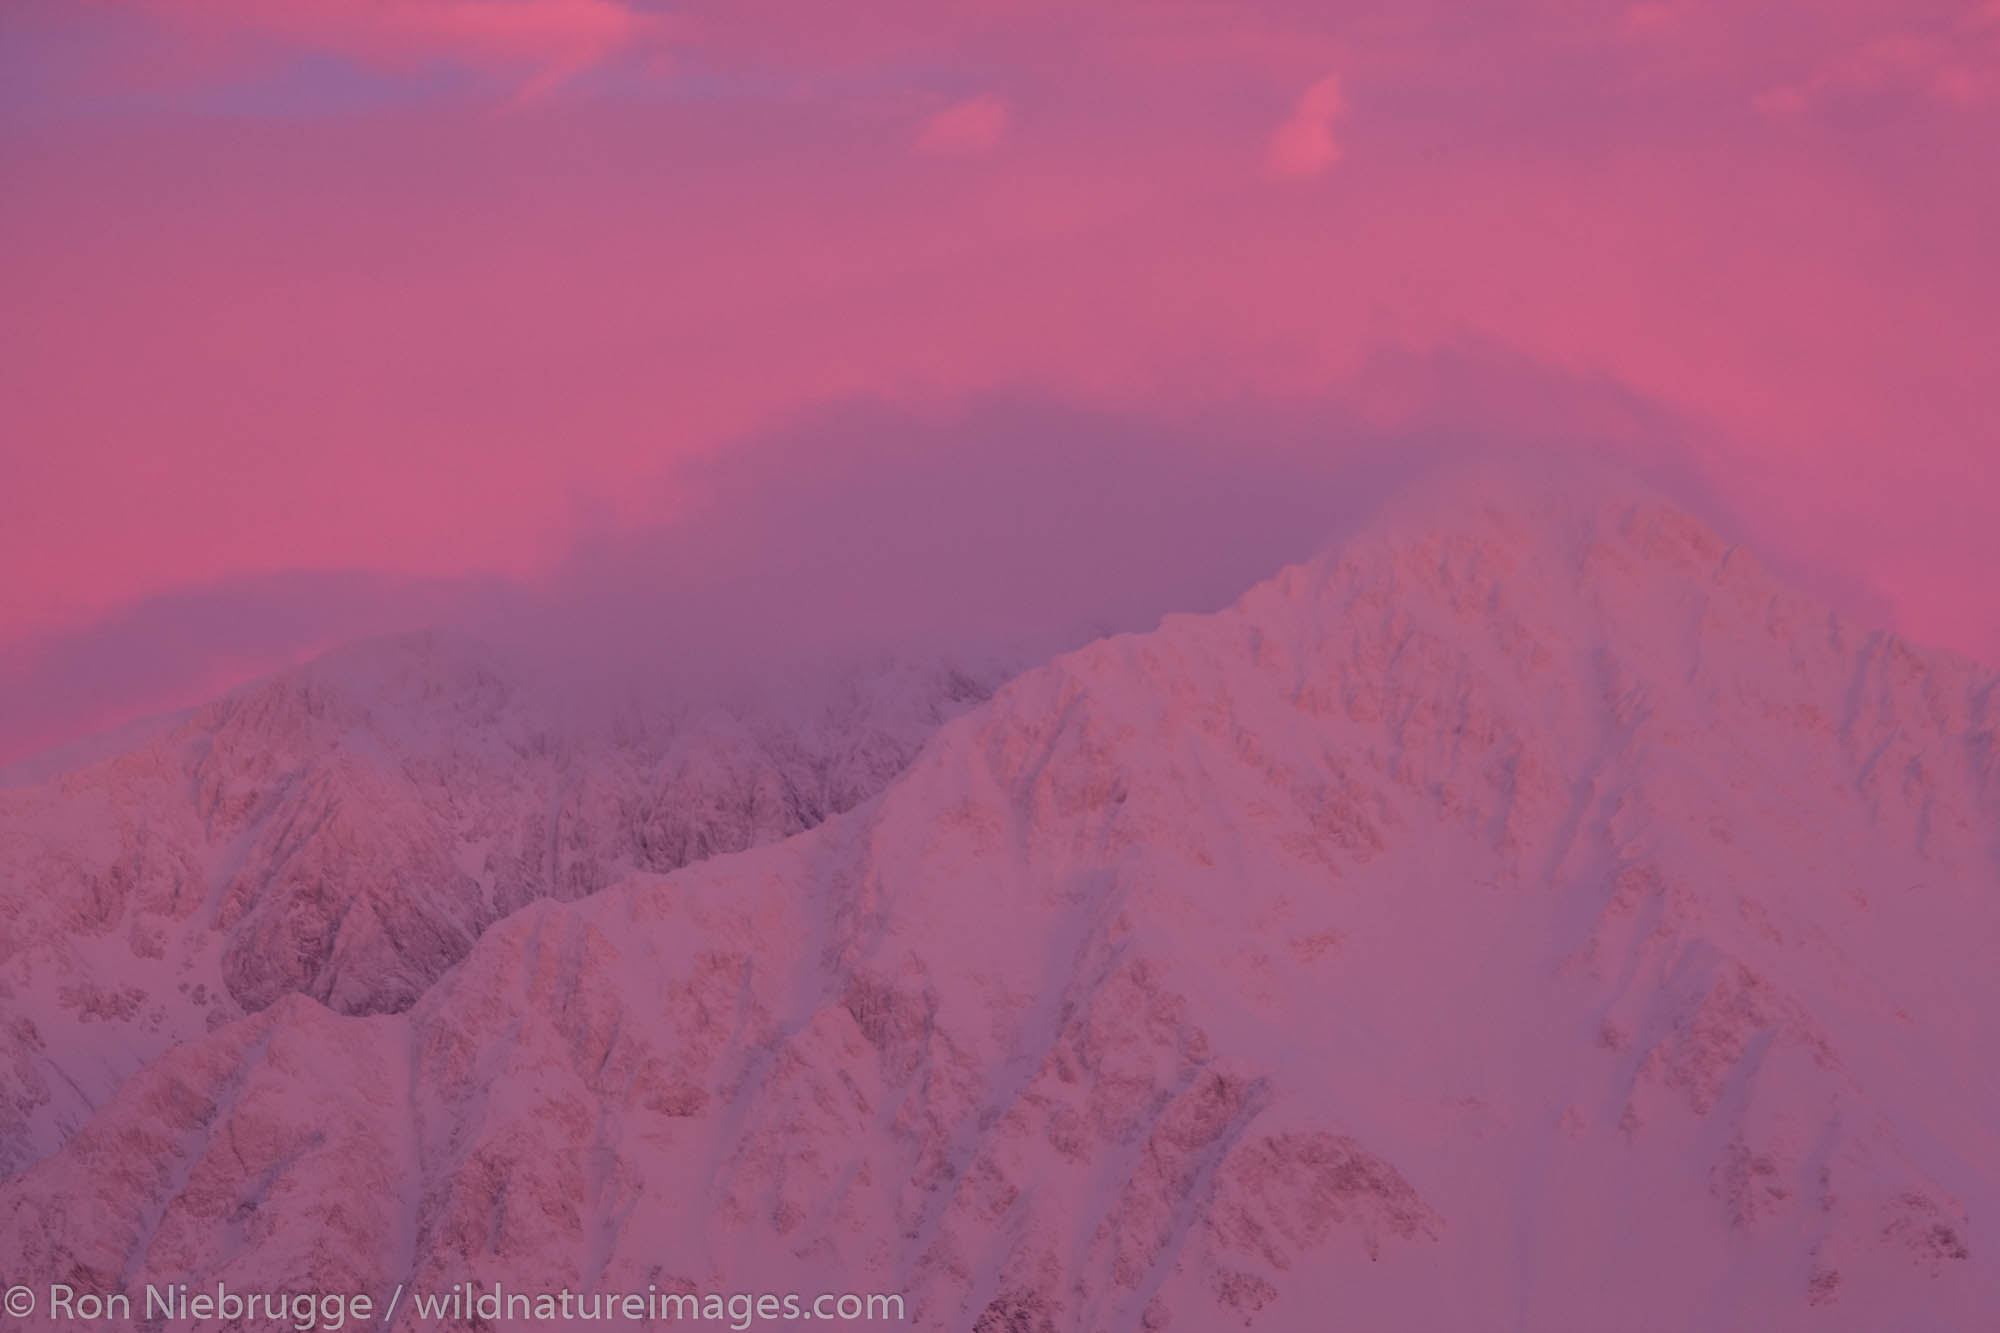 Resurrection Peak, Chugach National Forest, Seward, Alaska.